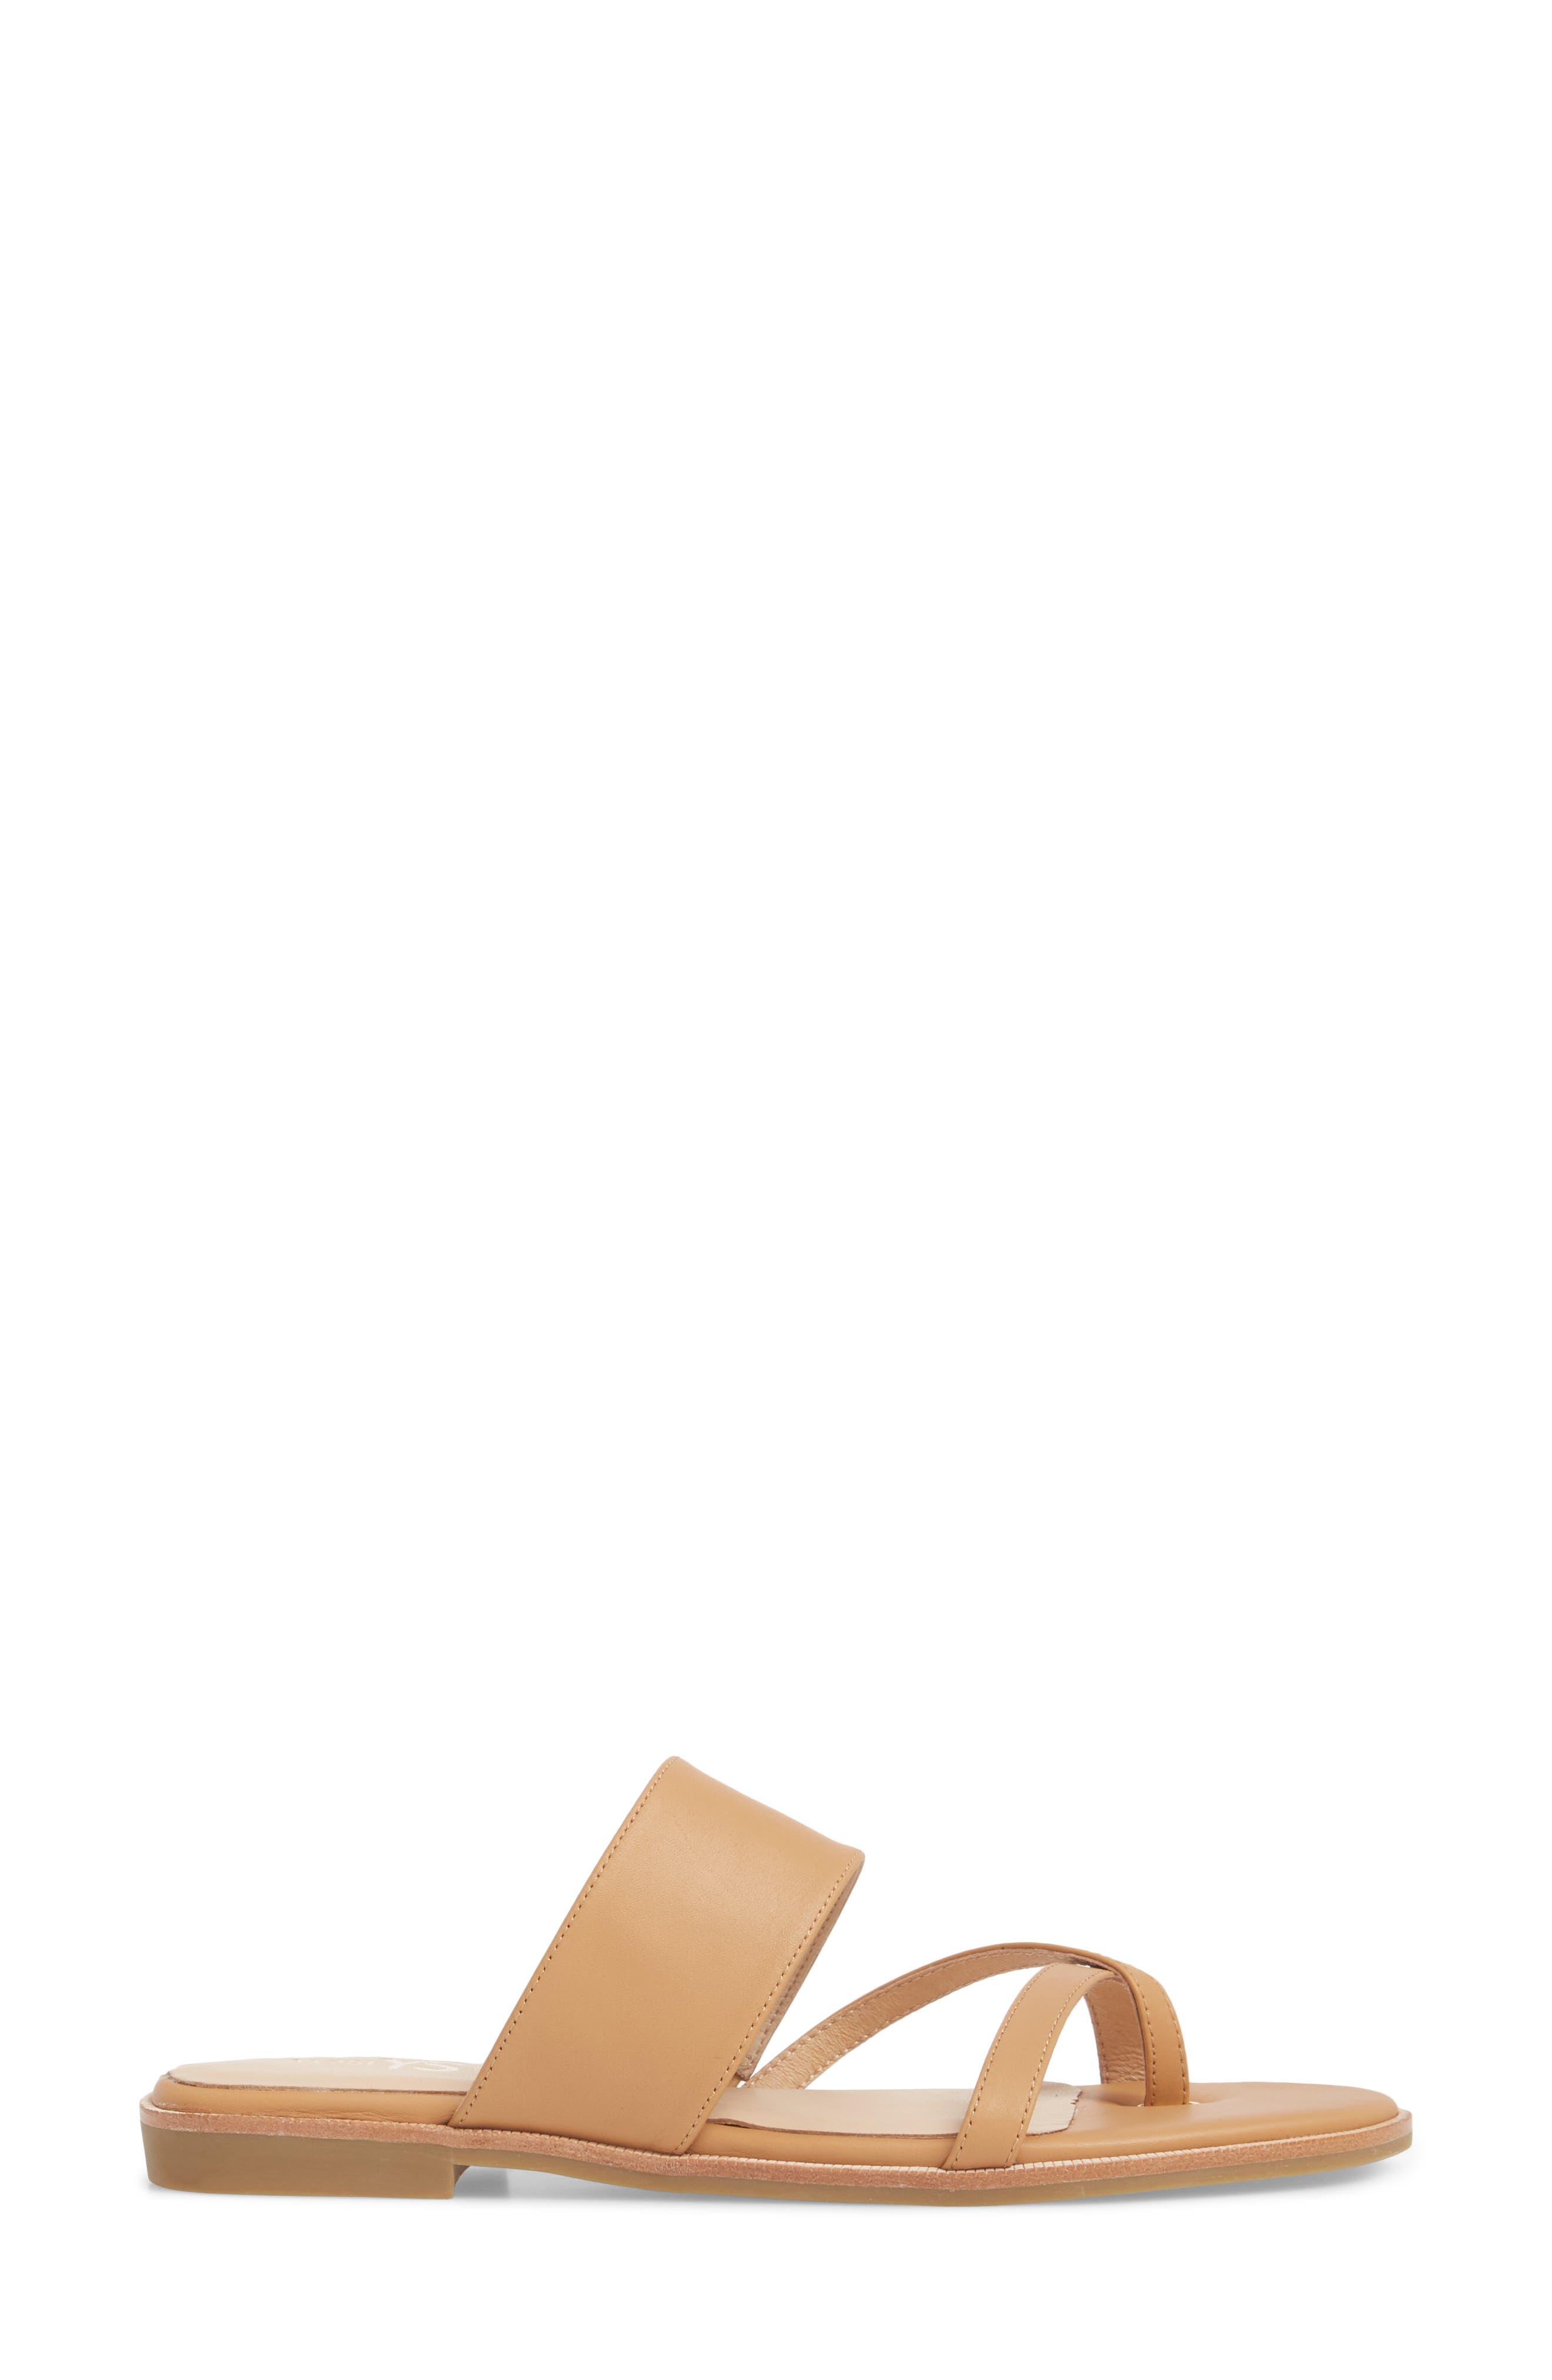 Carina Slide Sandal,                             Alternate thumbnail 6, color,